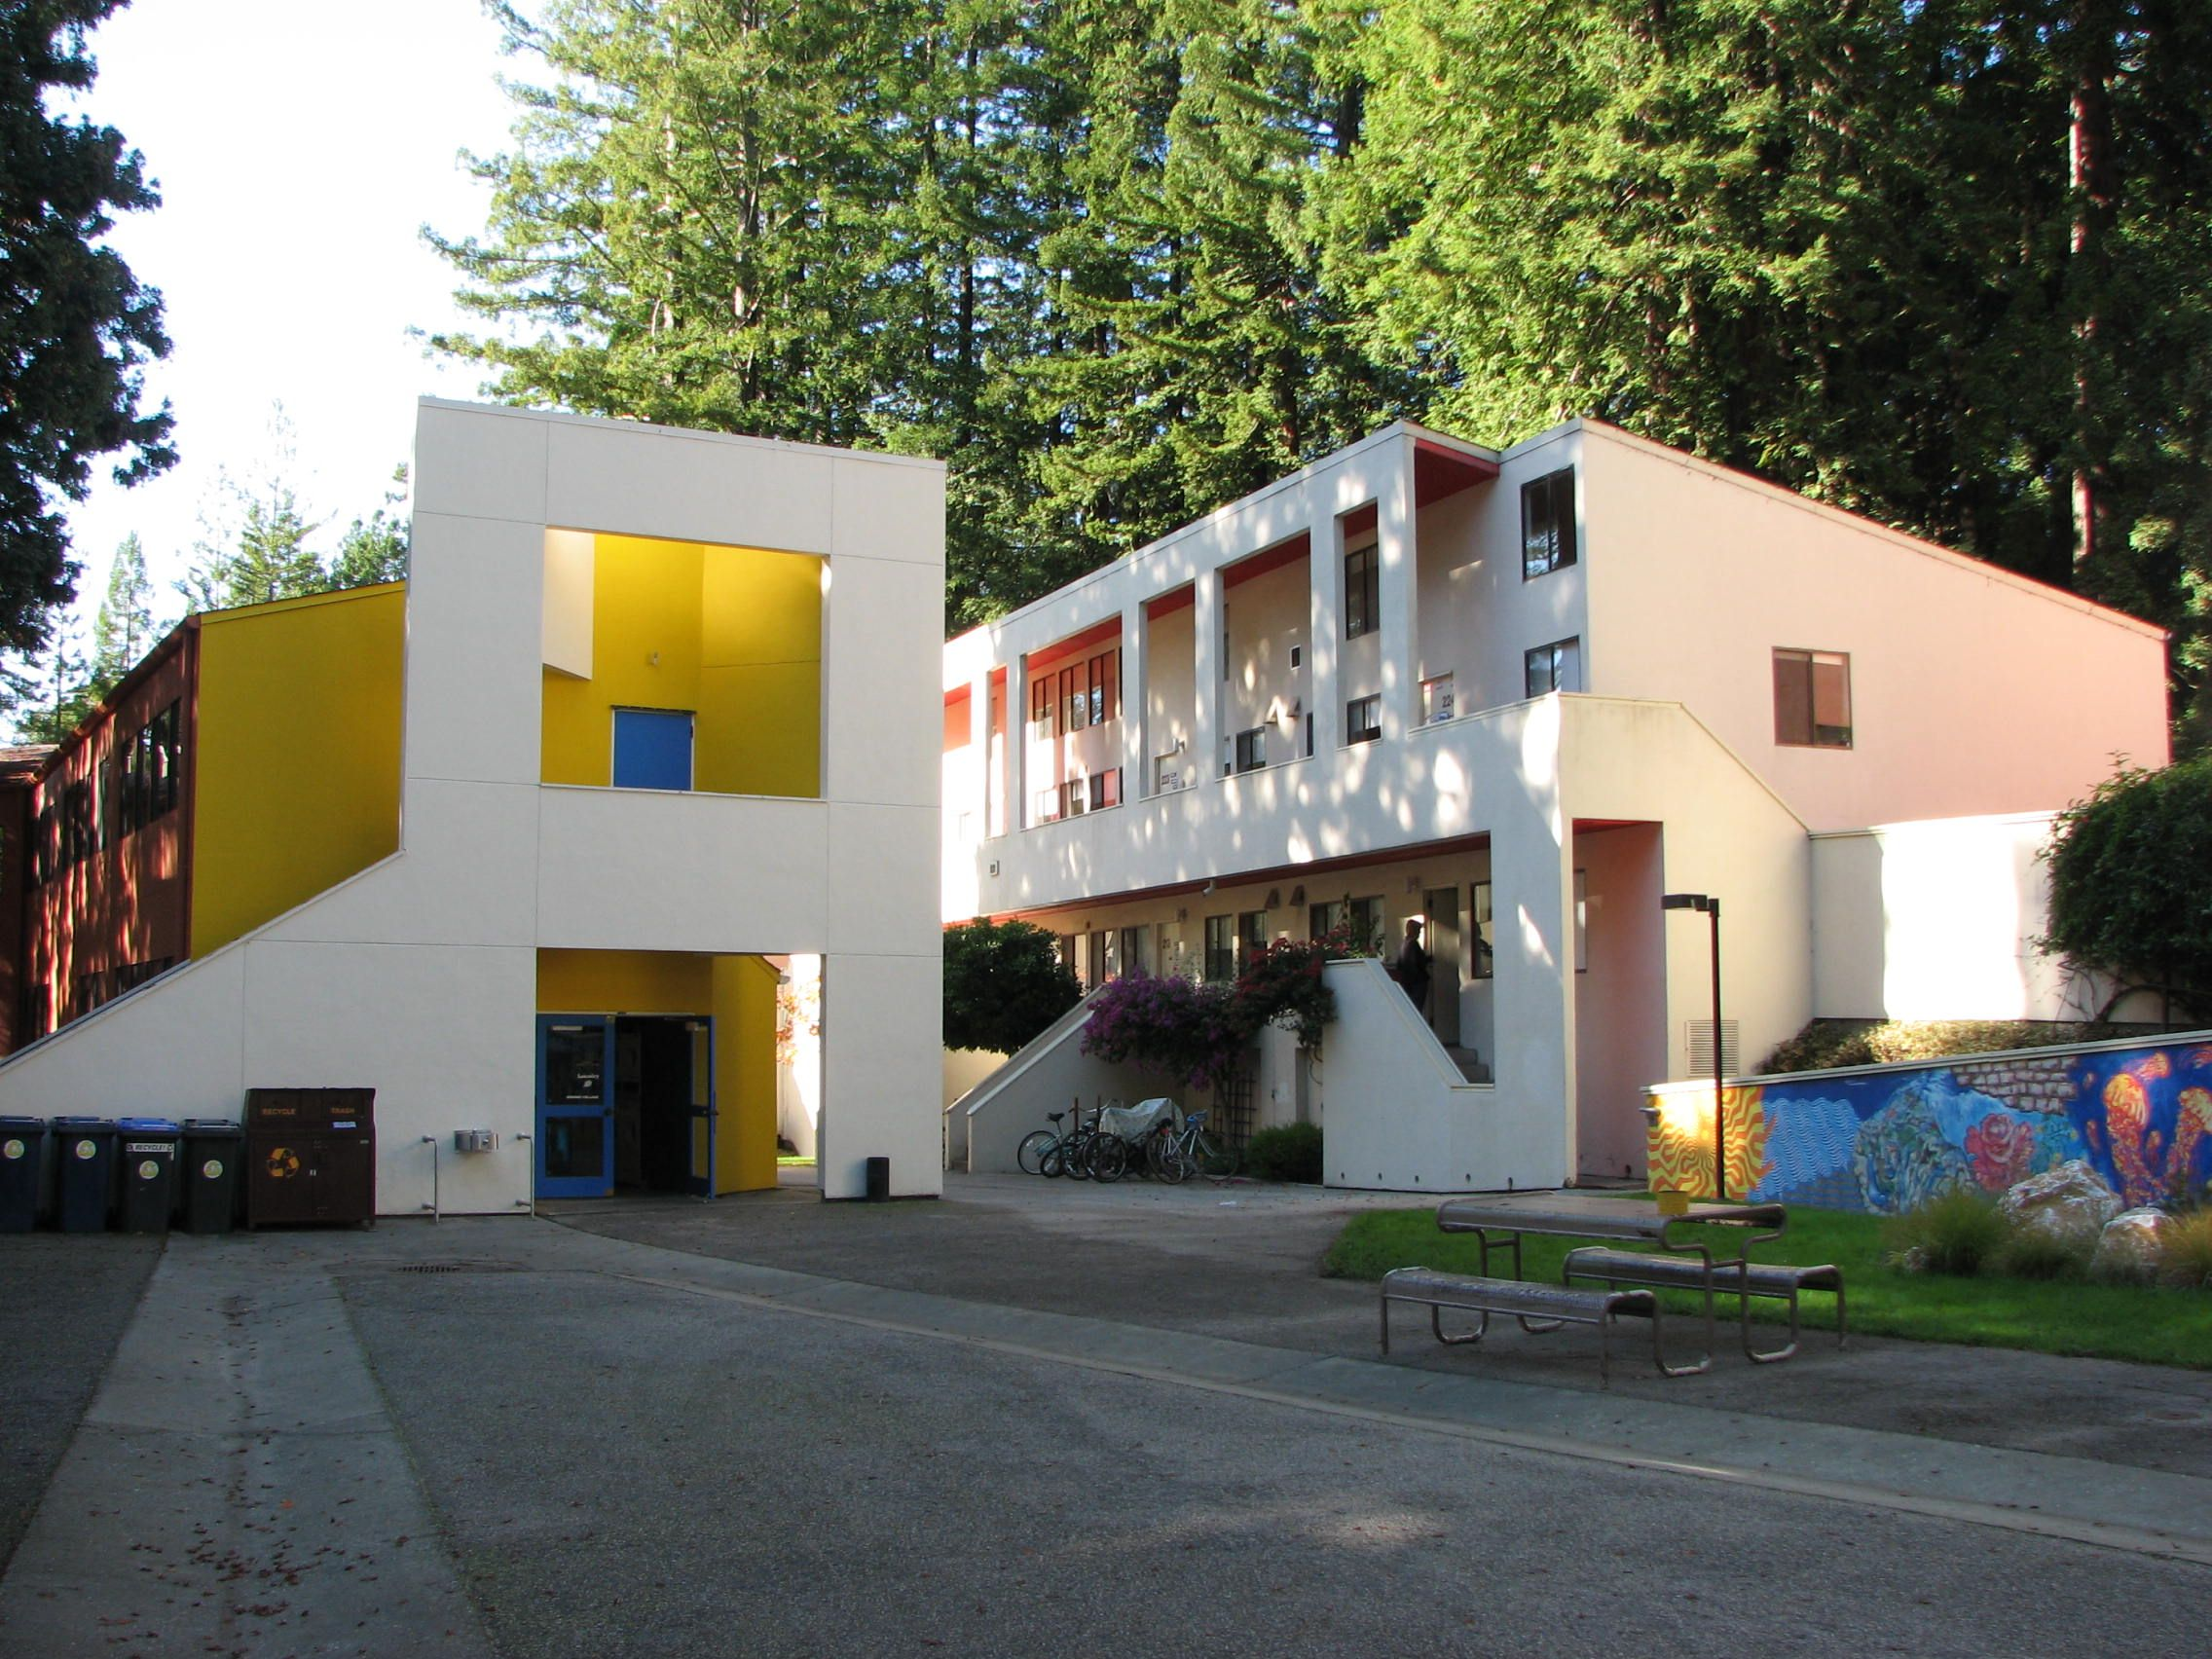 Kresges Architecture Was Designed To Look Like A Residential Area - Google maps kresgie college us santa cruz